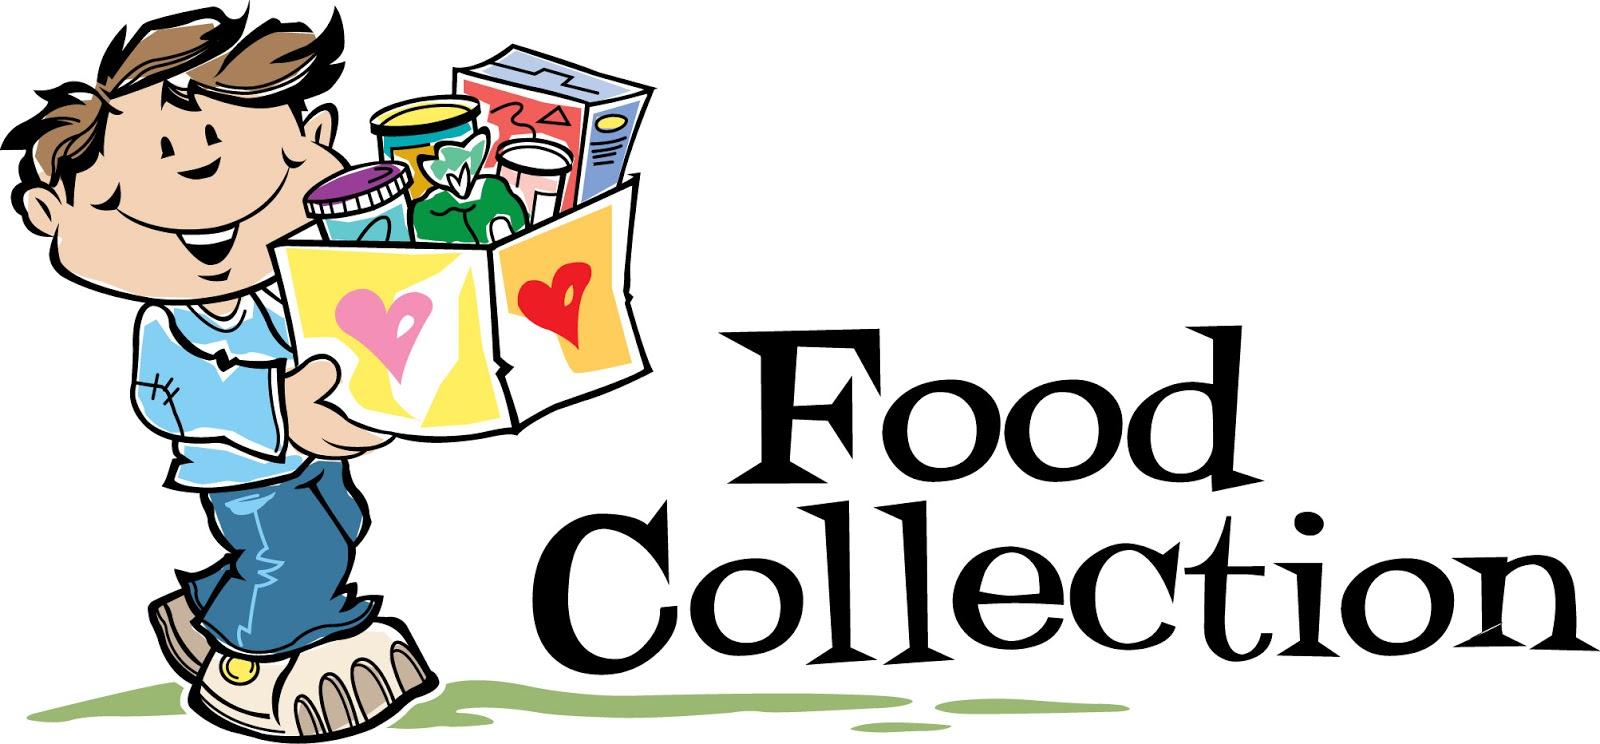 Food Drive Clipart Free Download Clip Art.